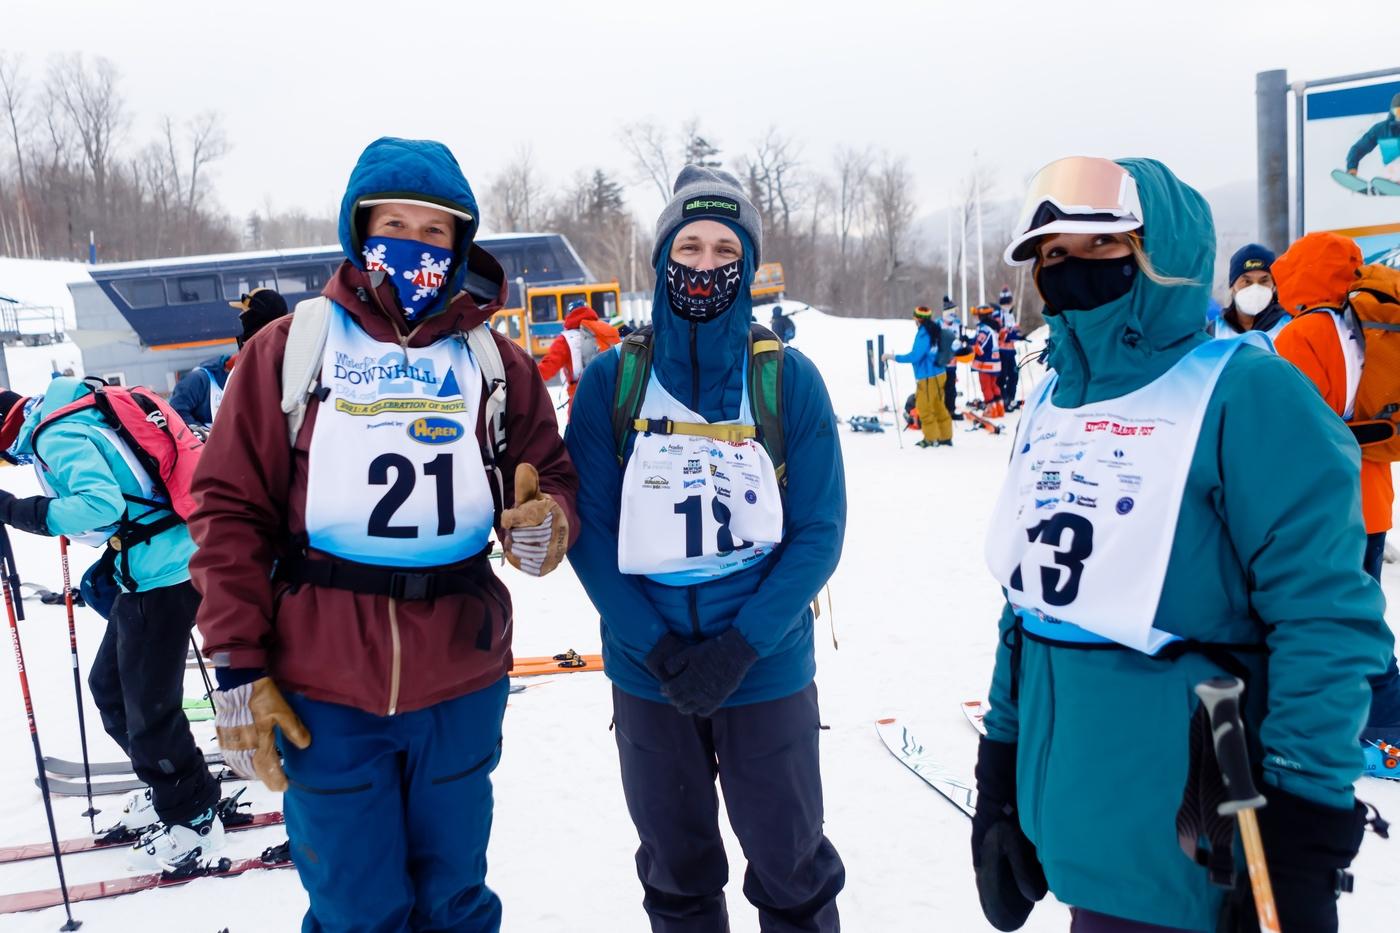 WinterKids Downhill 24 2021 SDP 3610